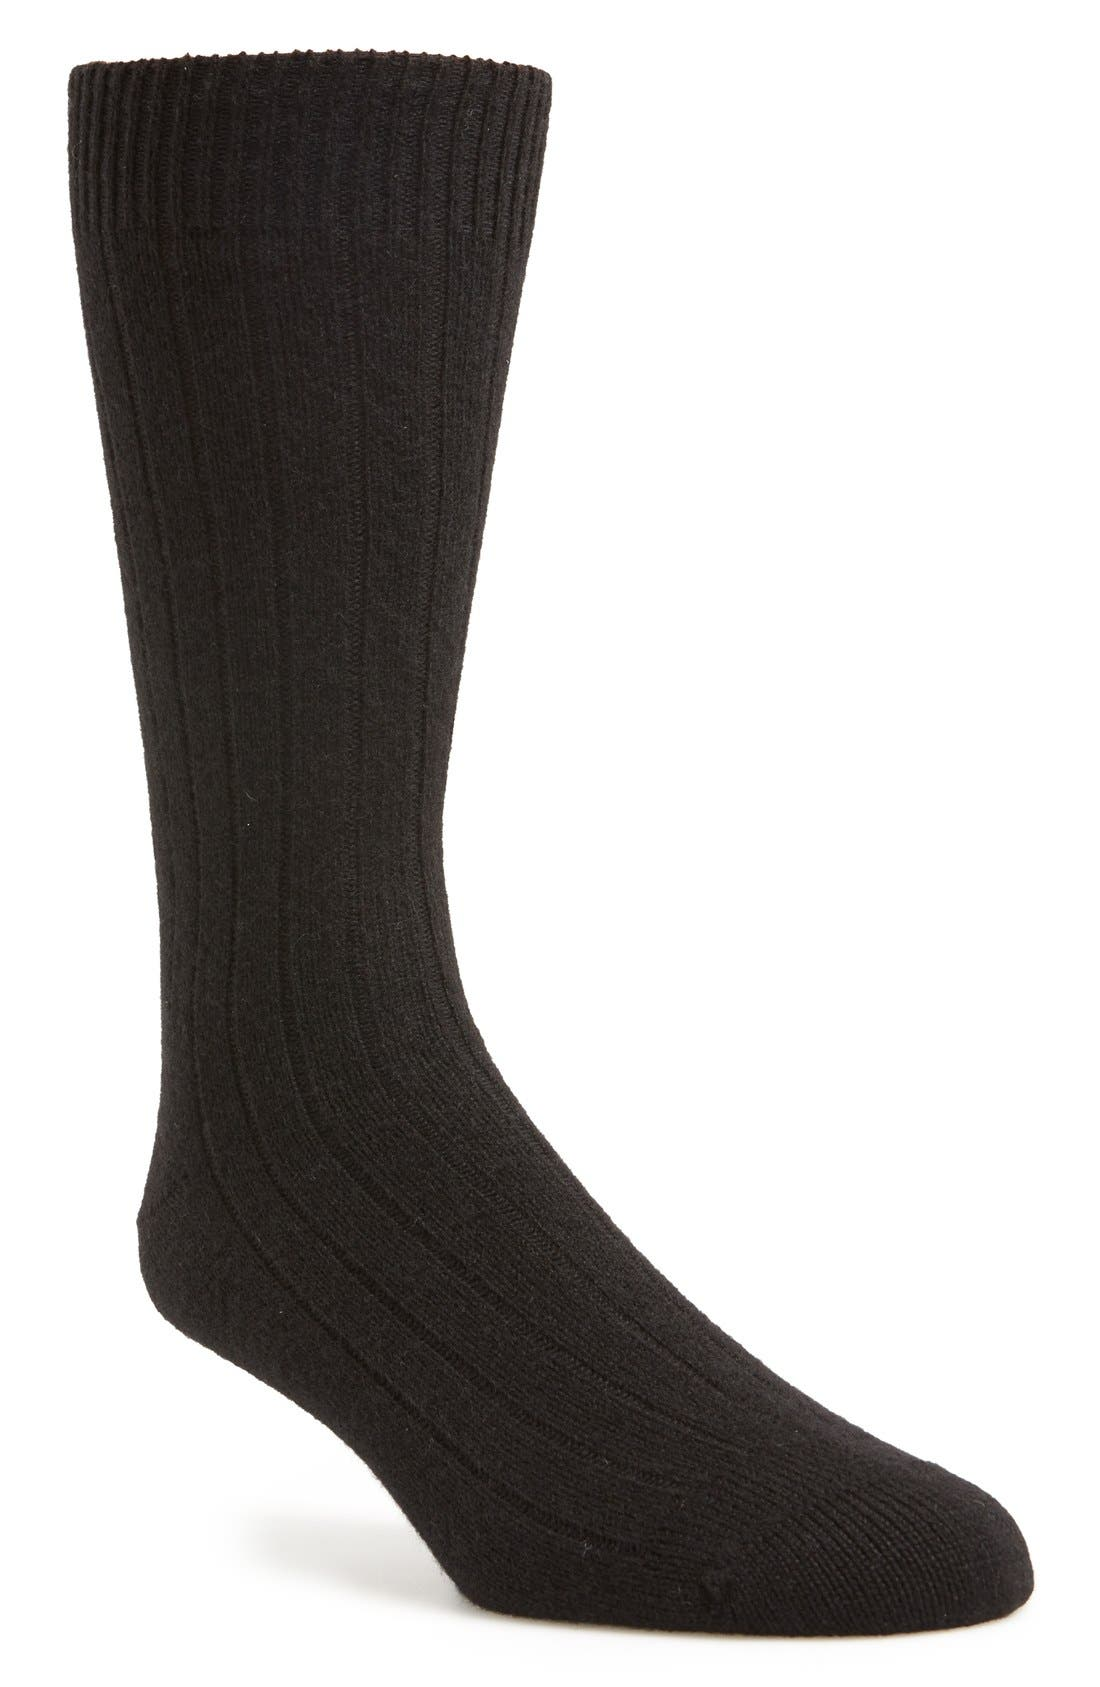 'Waddington' Cashmere Blend Mid Calf Socks,                         Main,                         color, Black